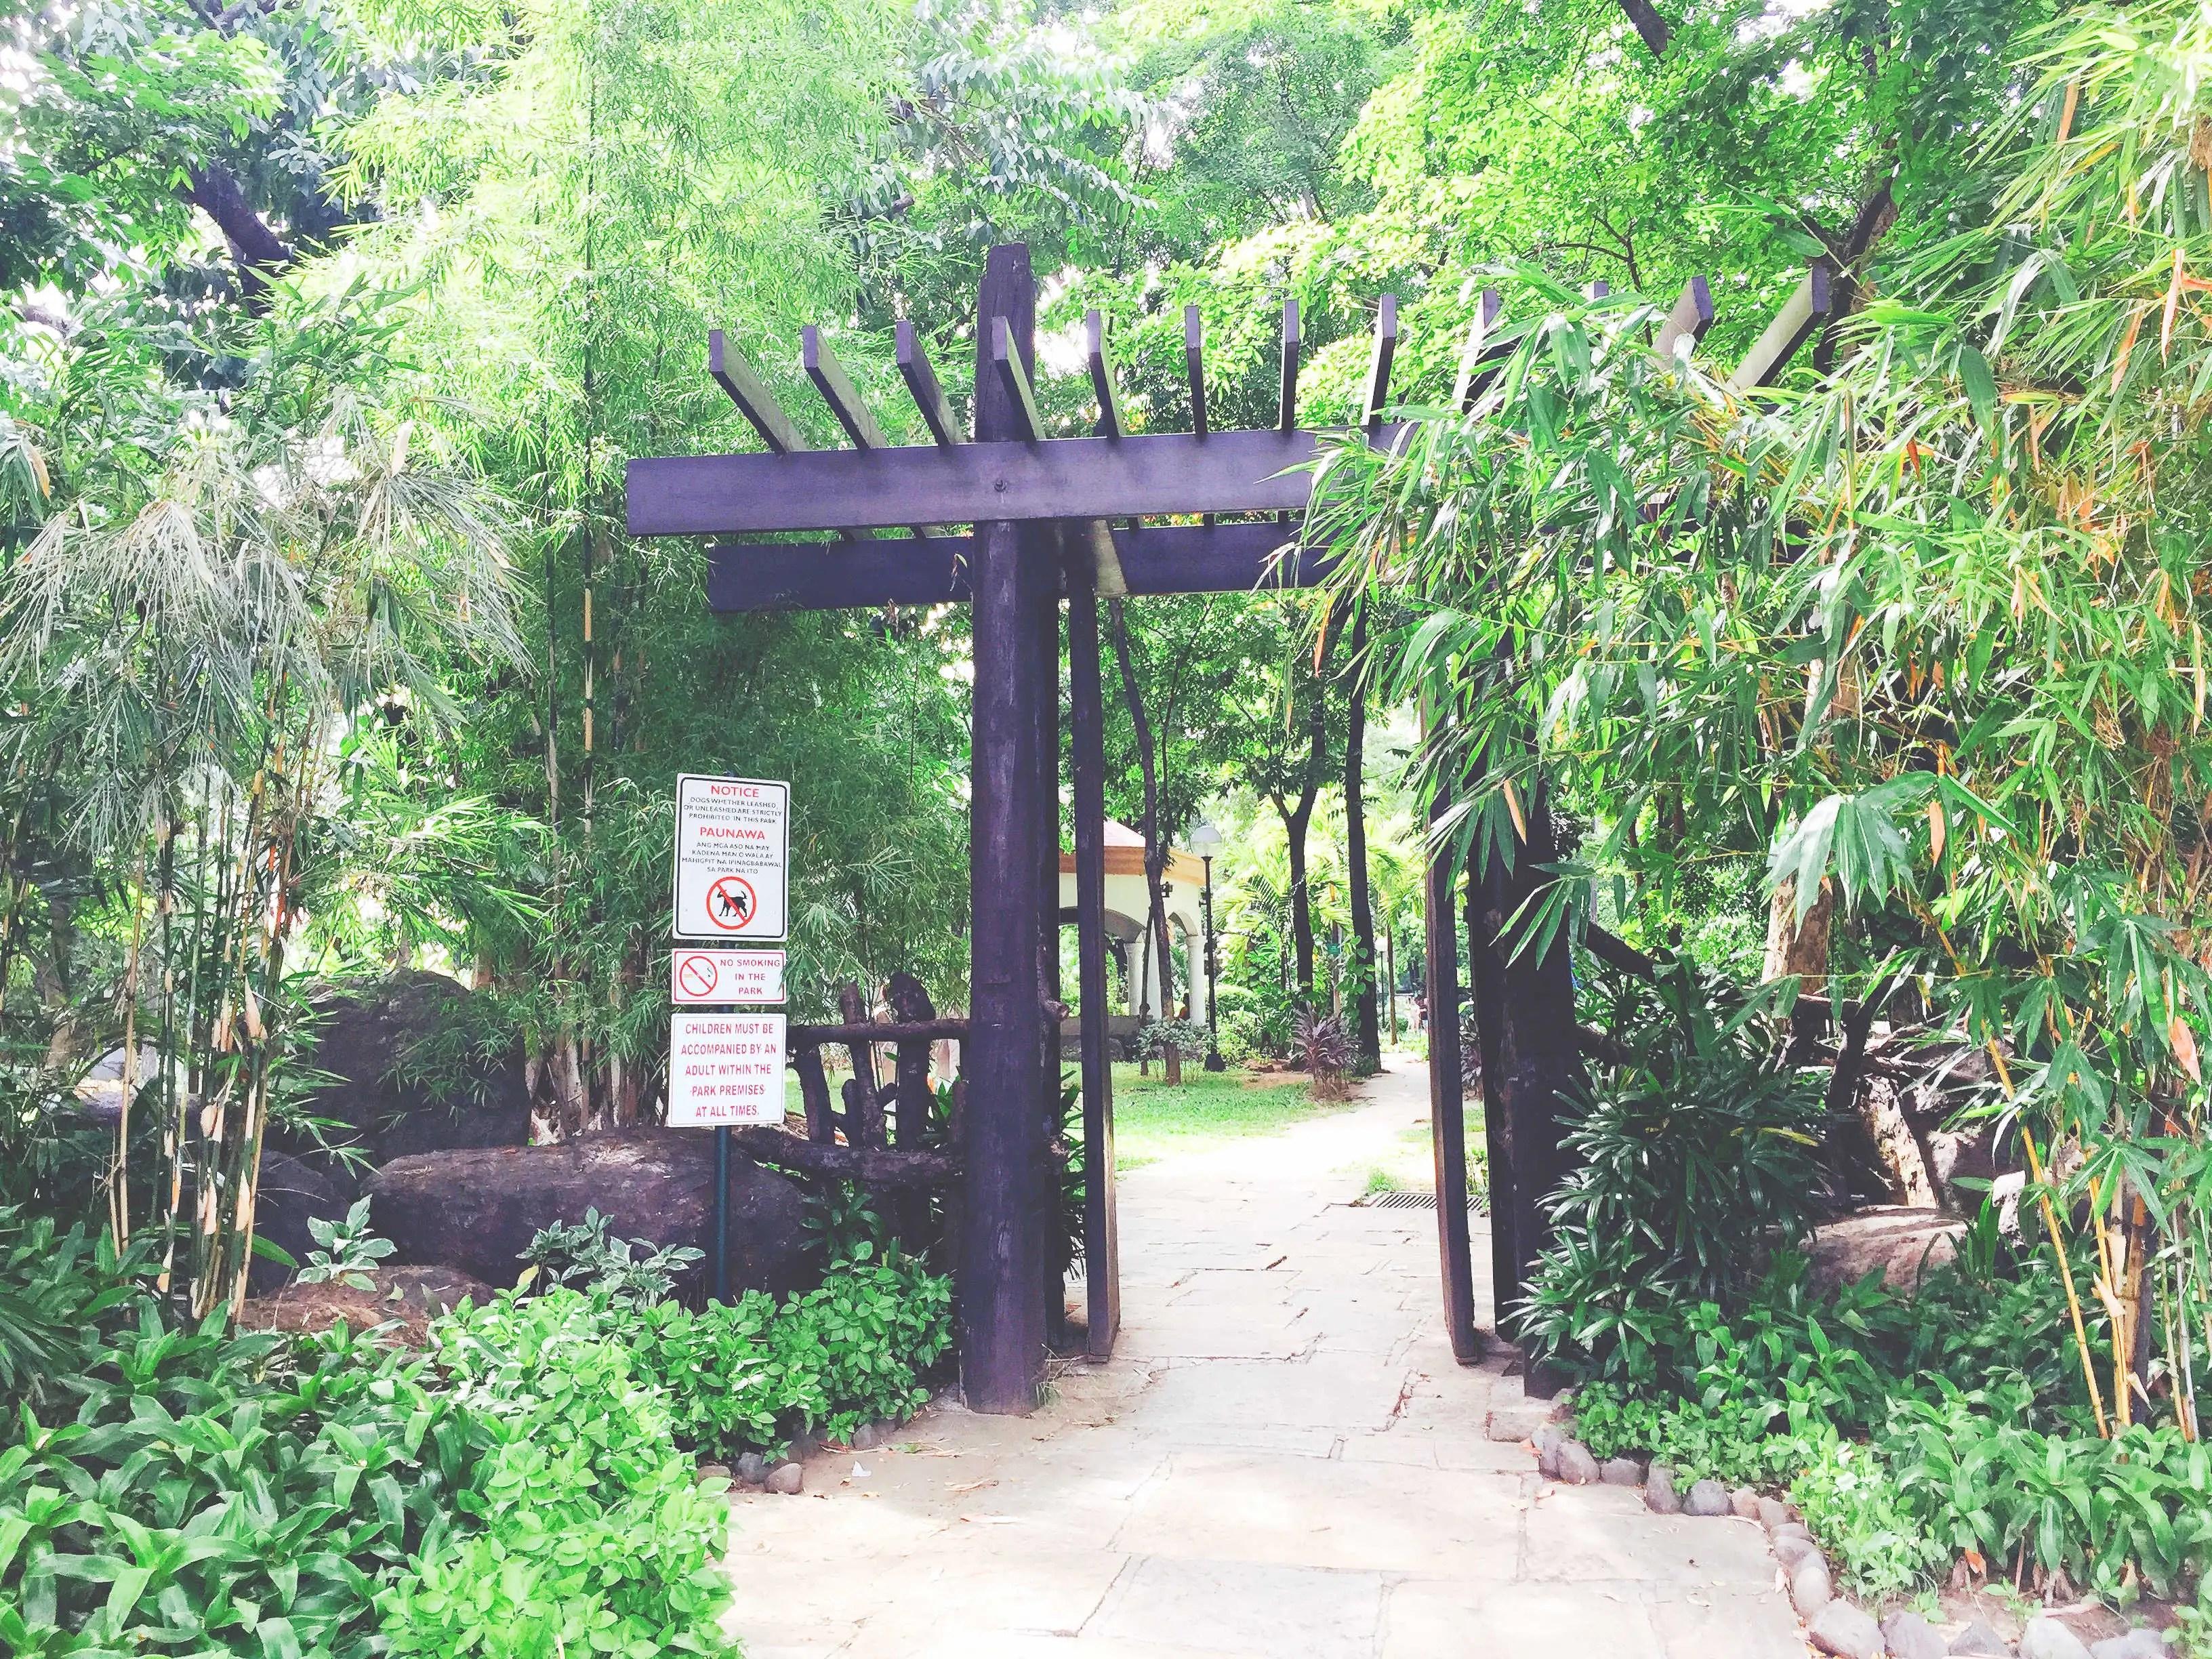 Zen Gate at Washington Sycip Park